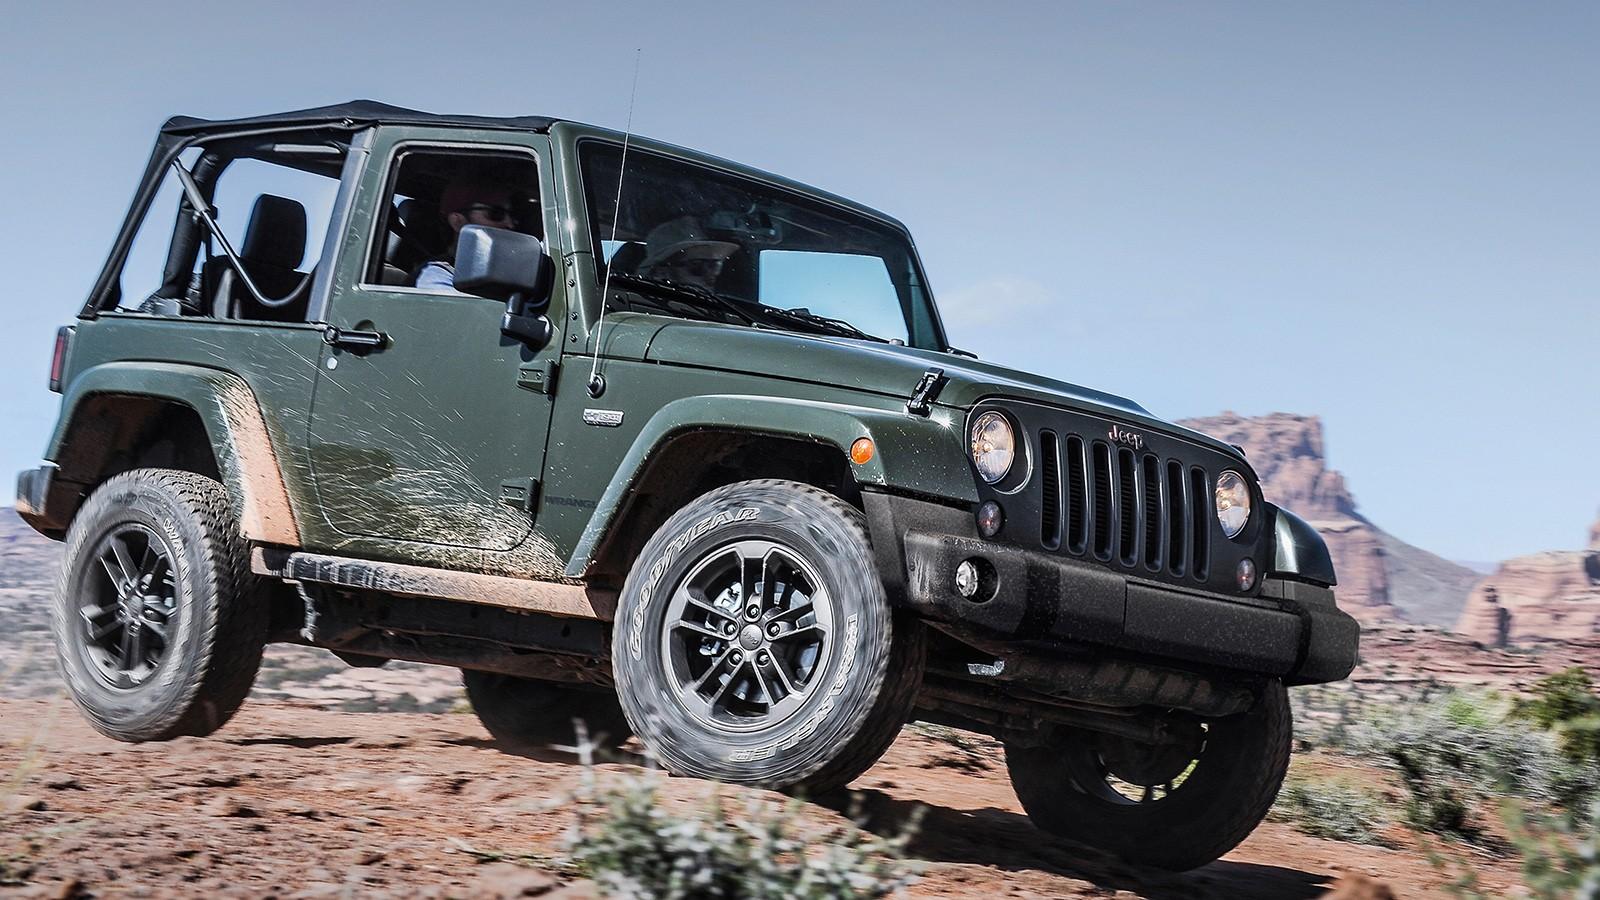 jeep_wrangler_75th_anniversary_17